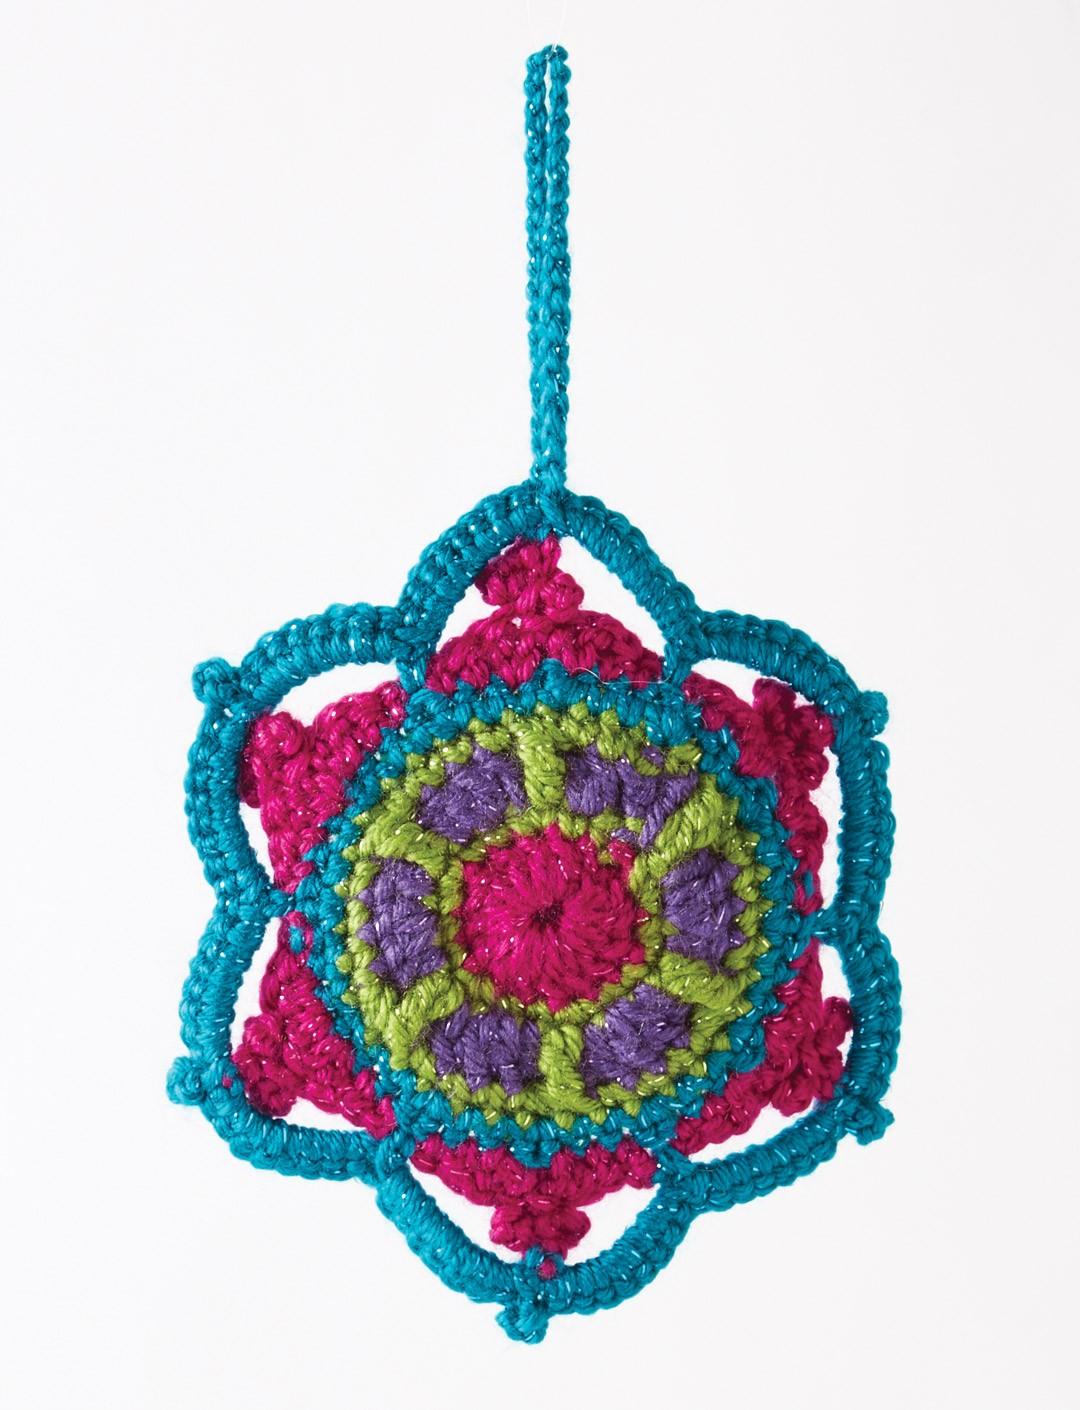 Crochet Jewelled Snowflake + Tutorial - The Crochet Crowd®